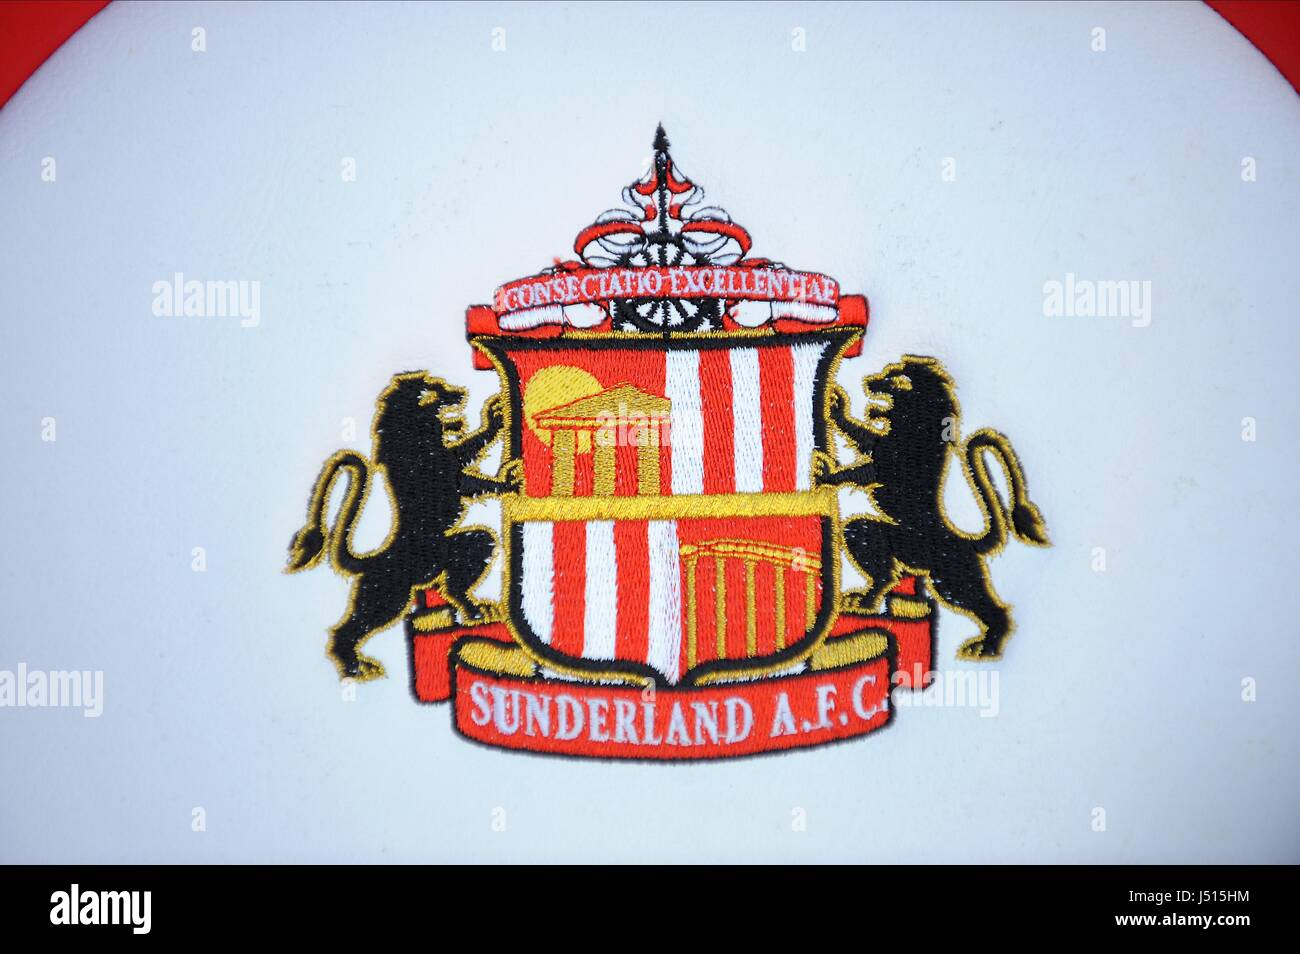 SUNDERLAND FC OFFICIAL CLUB BA SUNDERLAND FC V ARSENAL FC STADIUM OF LIGHT SUNDERLAND ENGLAND 25 October 2014 - Stock Image